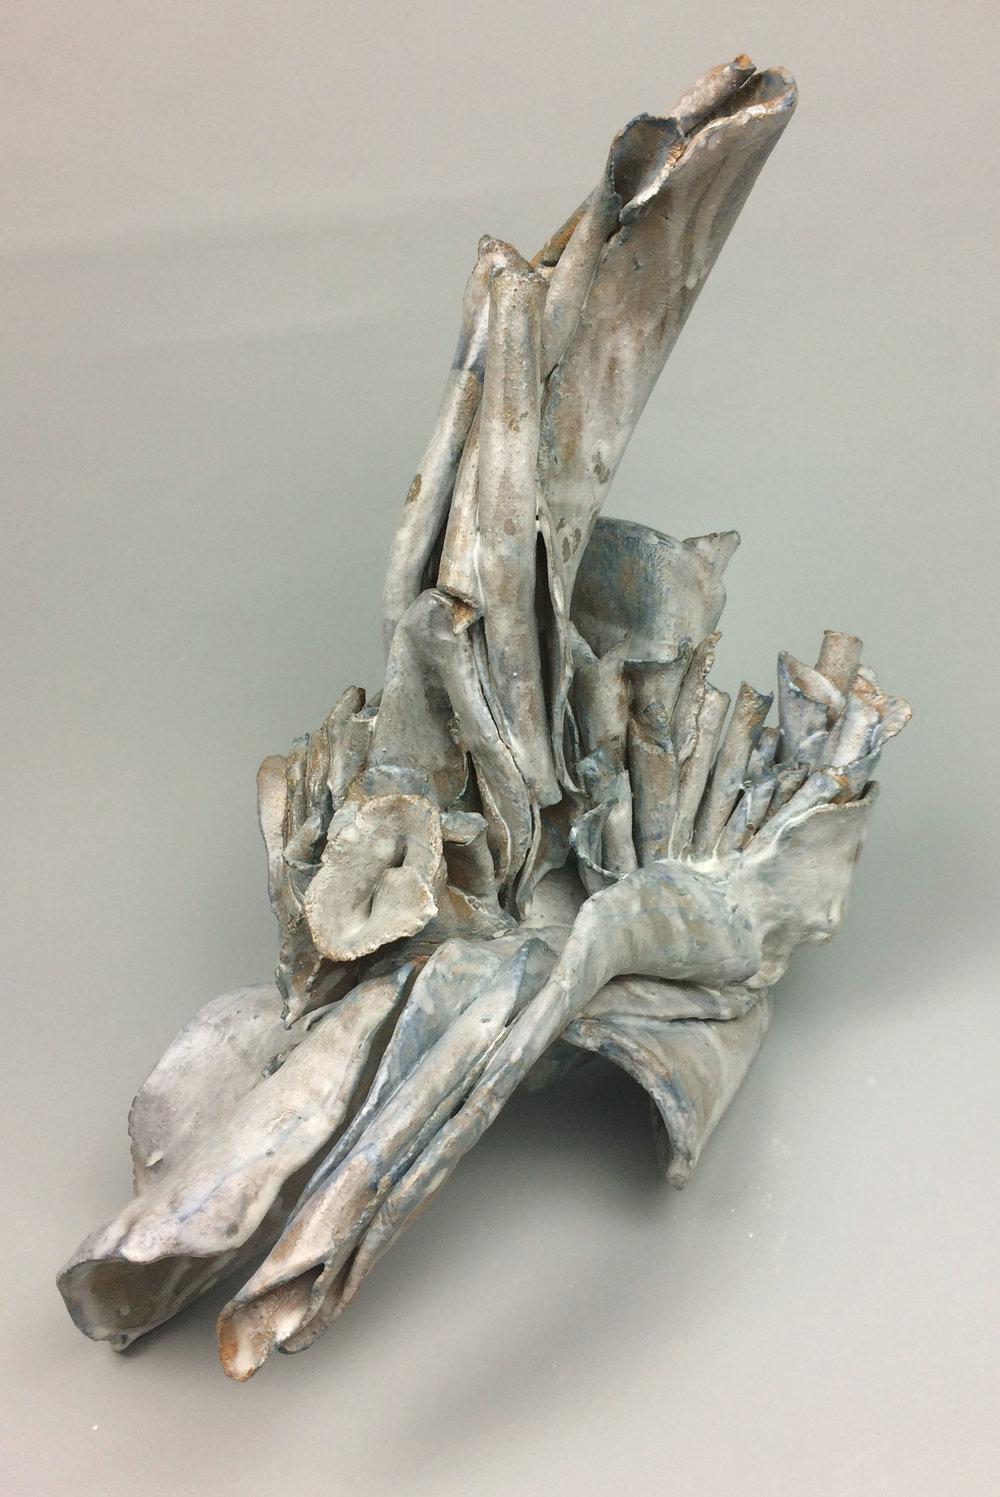 Sara Fine-Wilson,  Open , Stoneware, 17x15x15